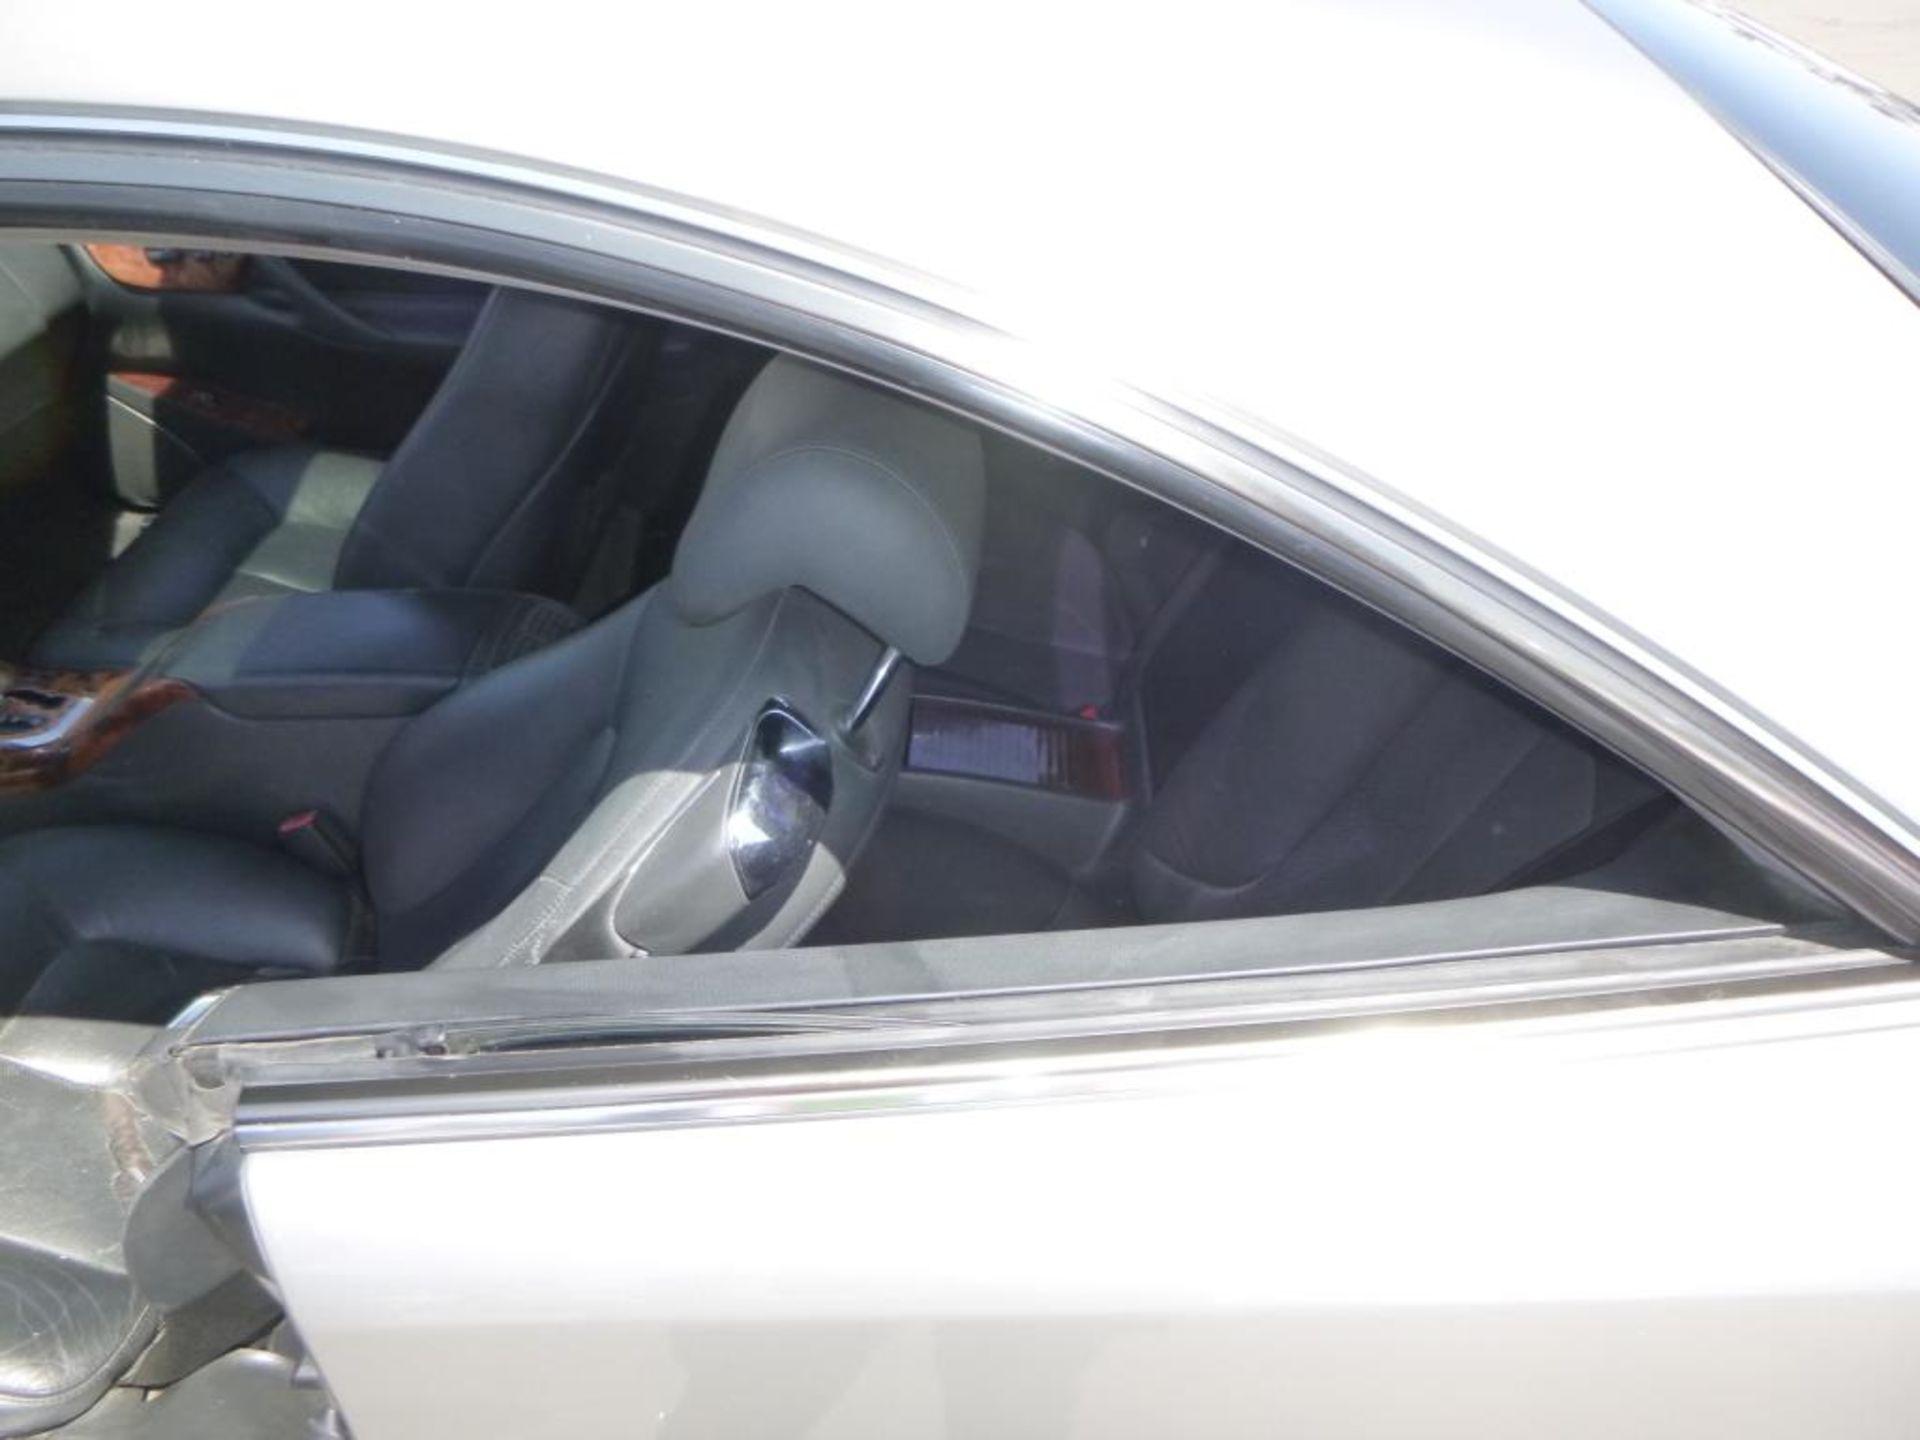 2004 Mercedes-Benz CL-Class - Image 5 of 15